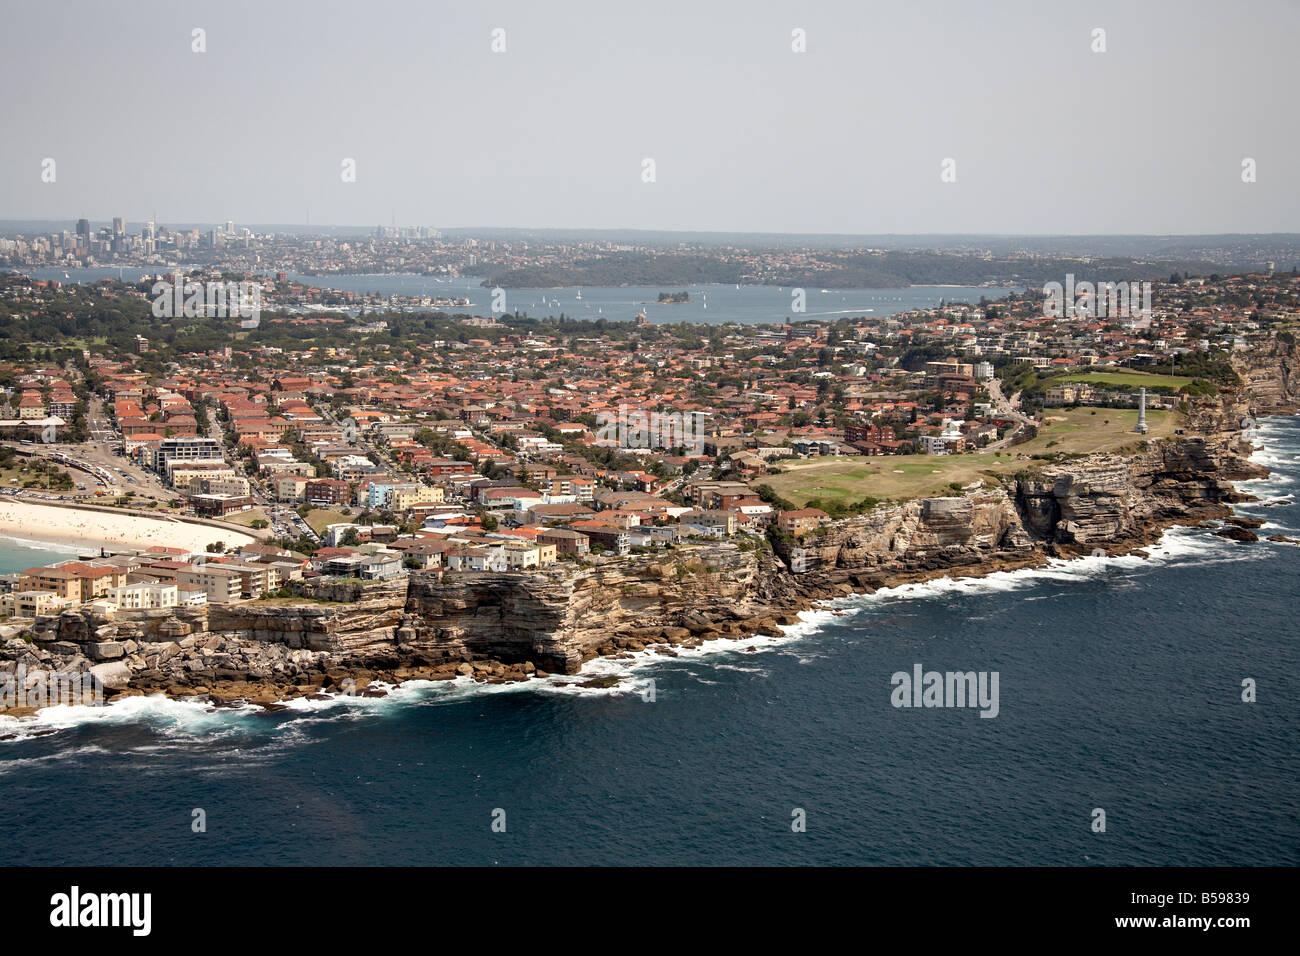 Aerial view north west of suburban houses Ben Buckler Bondi Sydney NSW Australia High level oblique Stock Photo